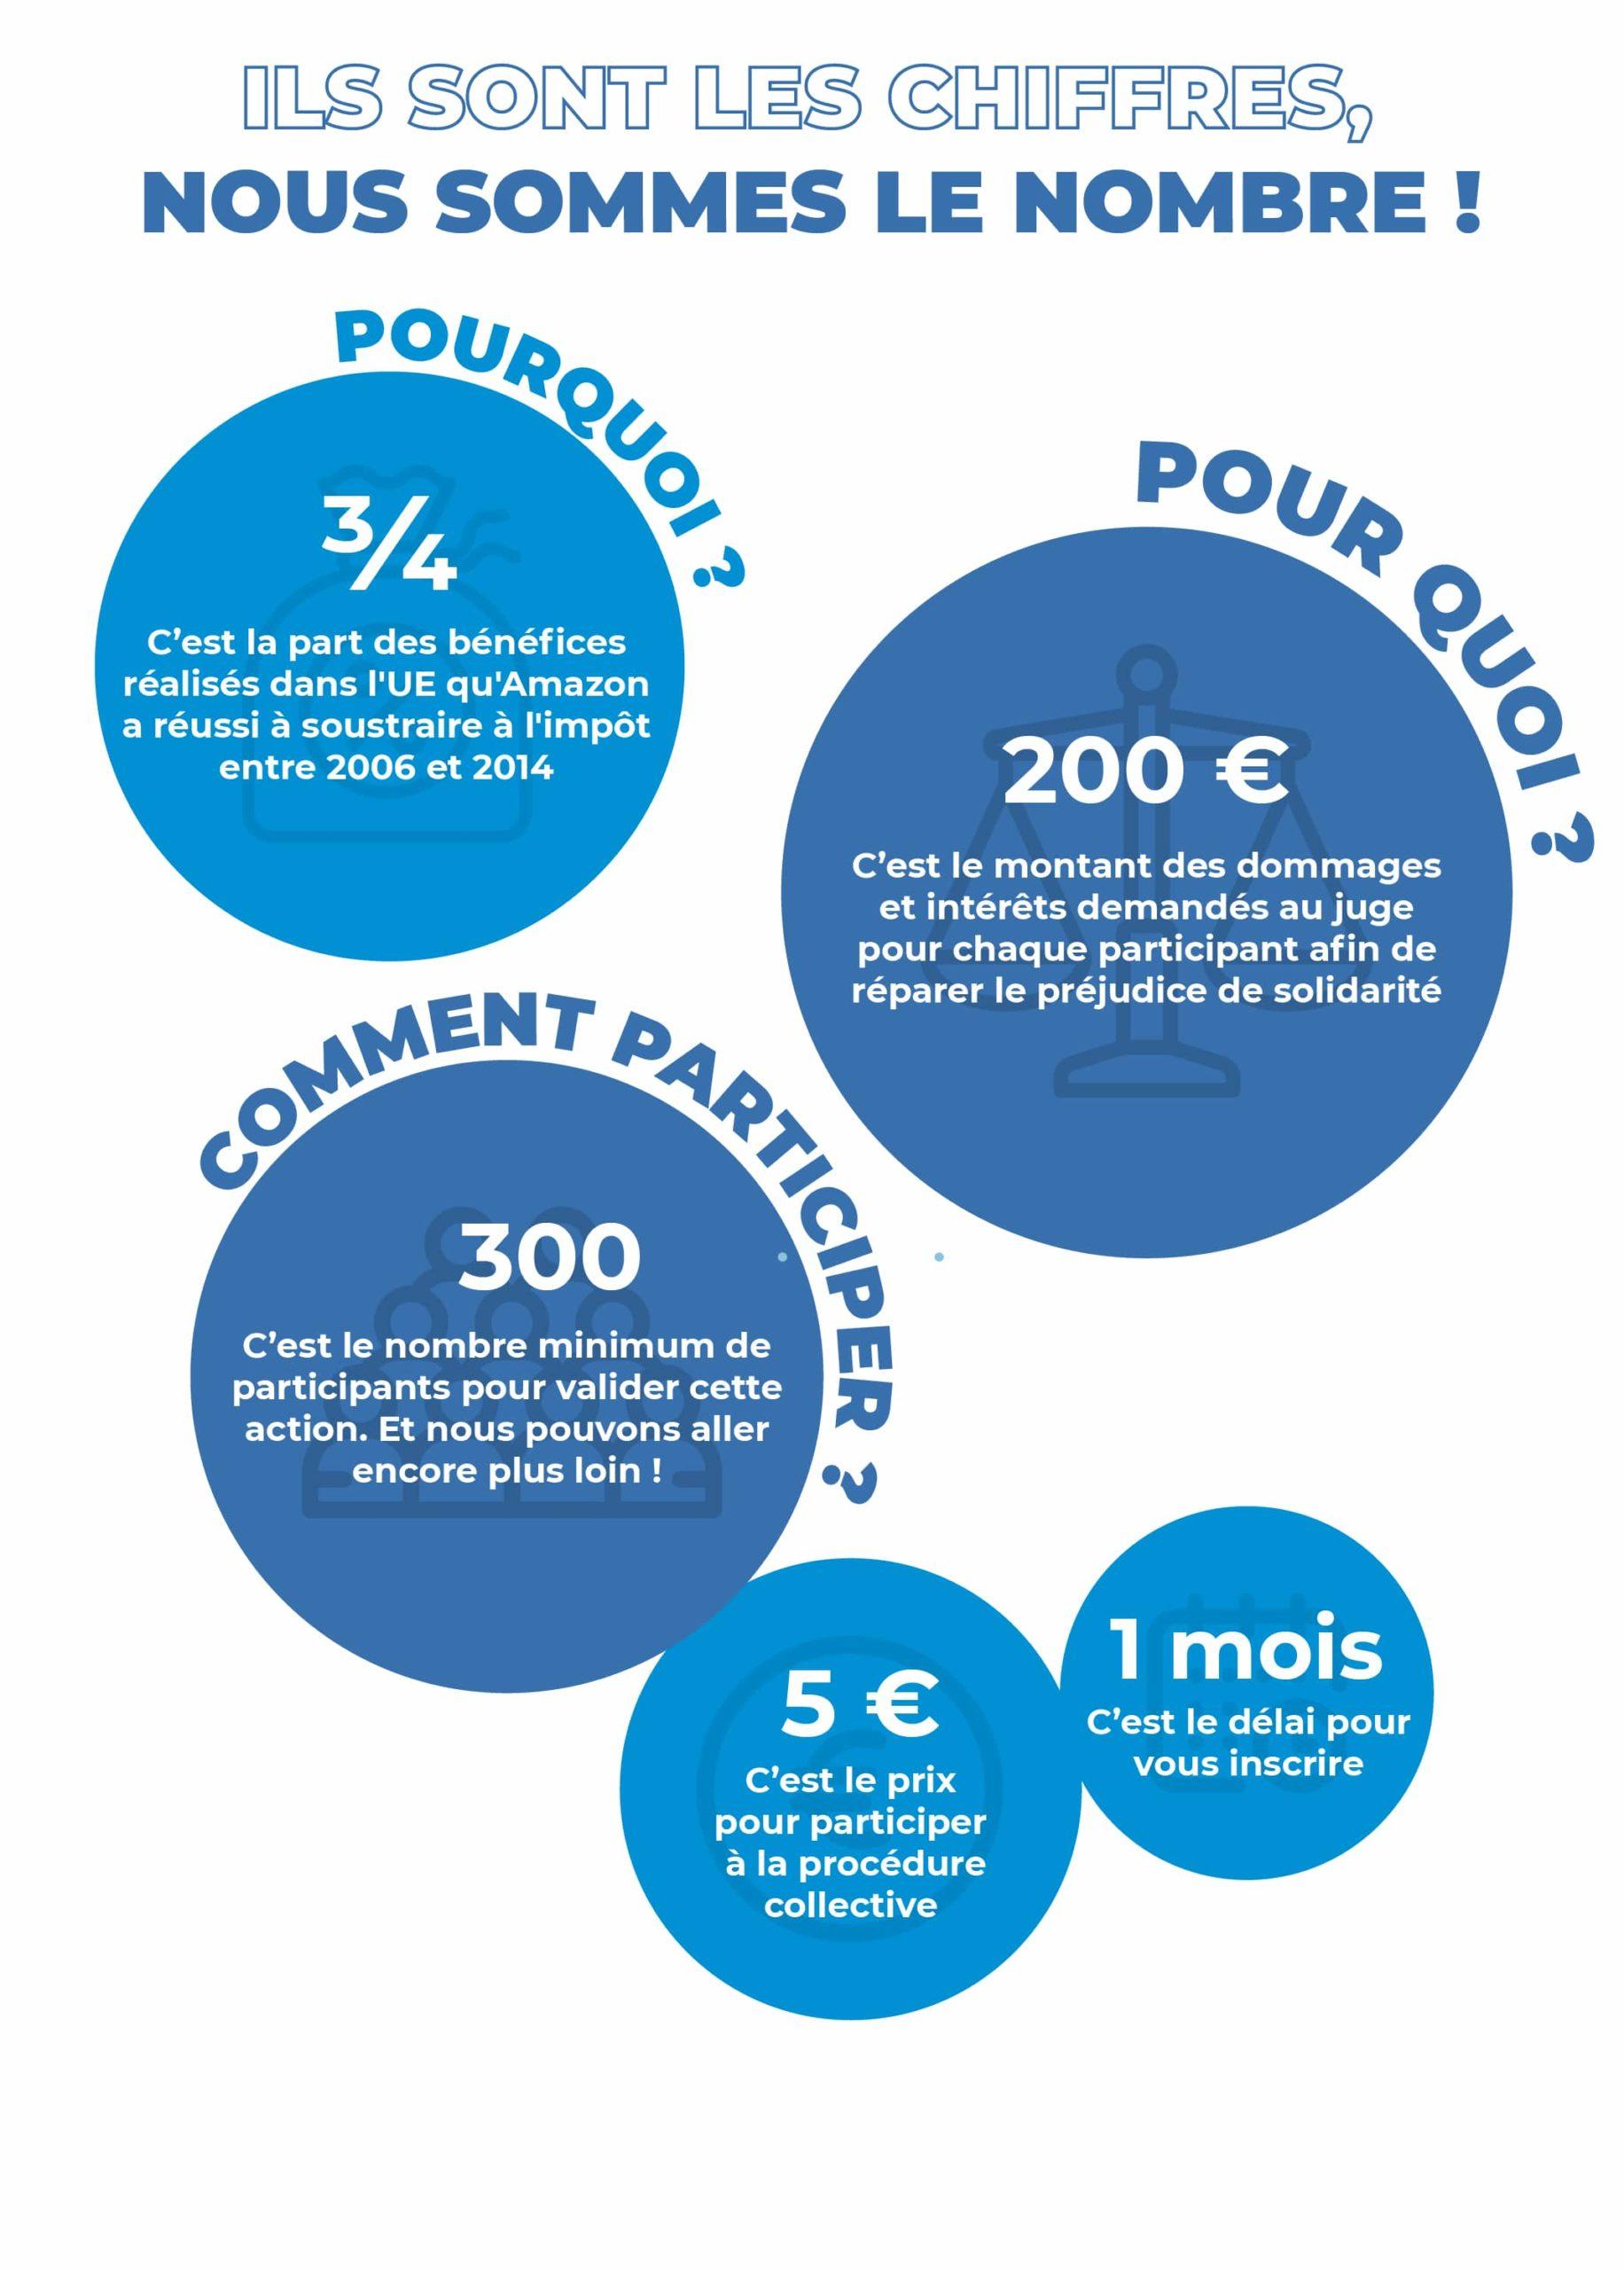 infographie_fondblanc-min